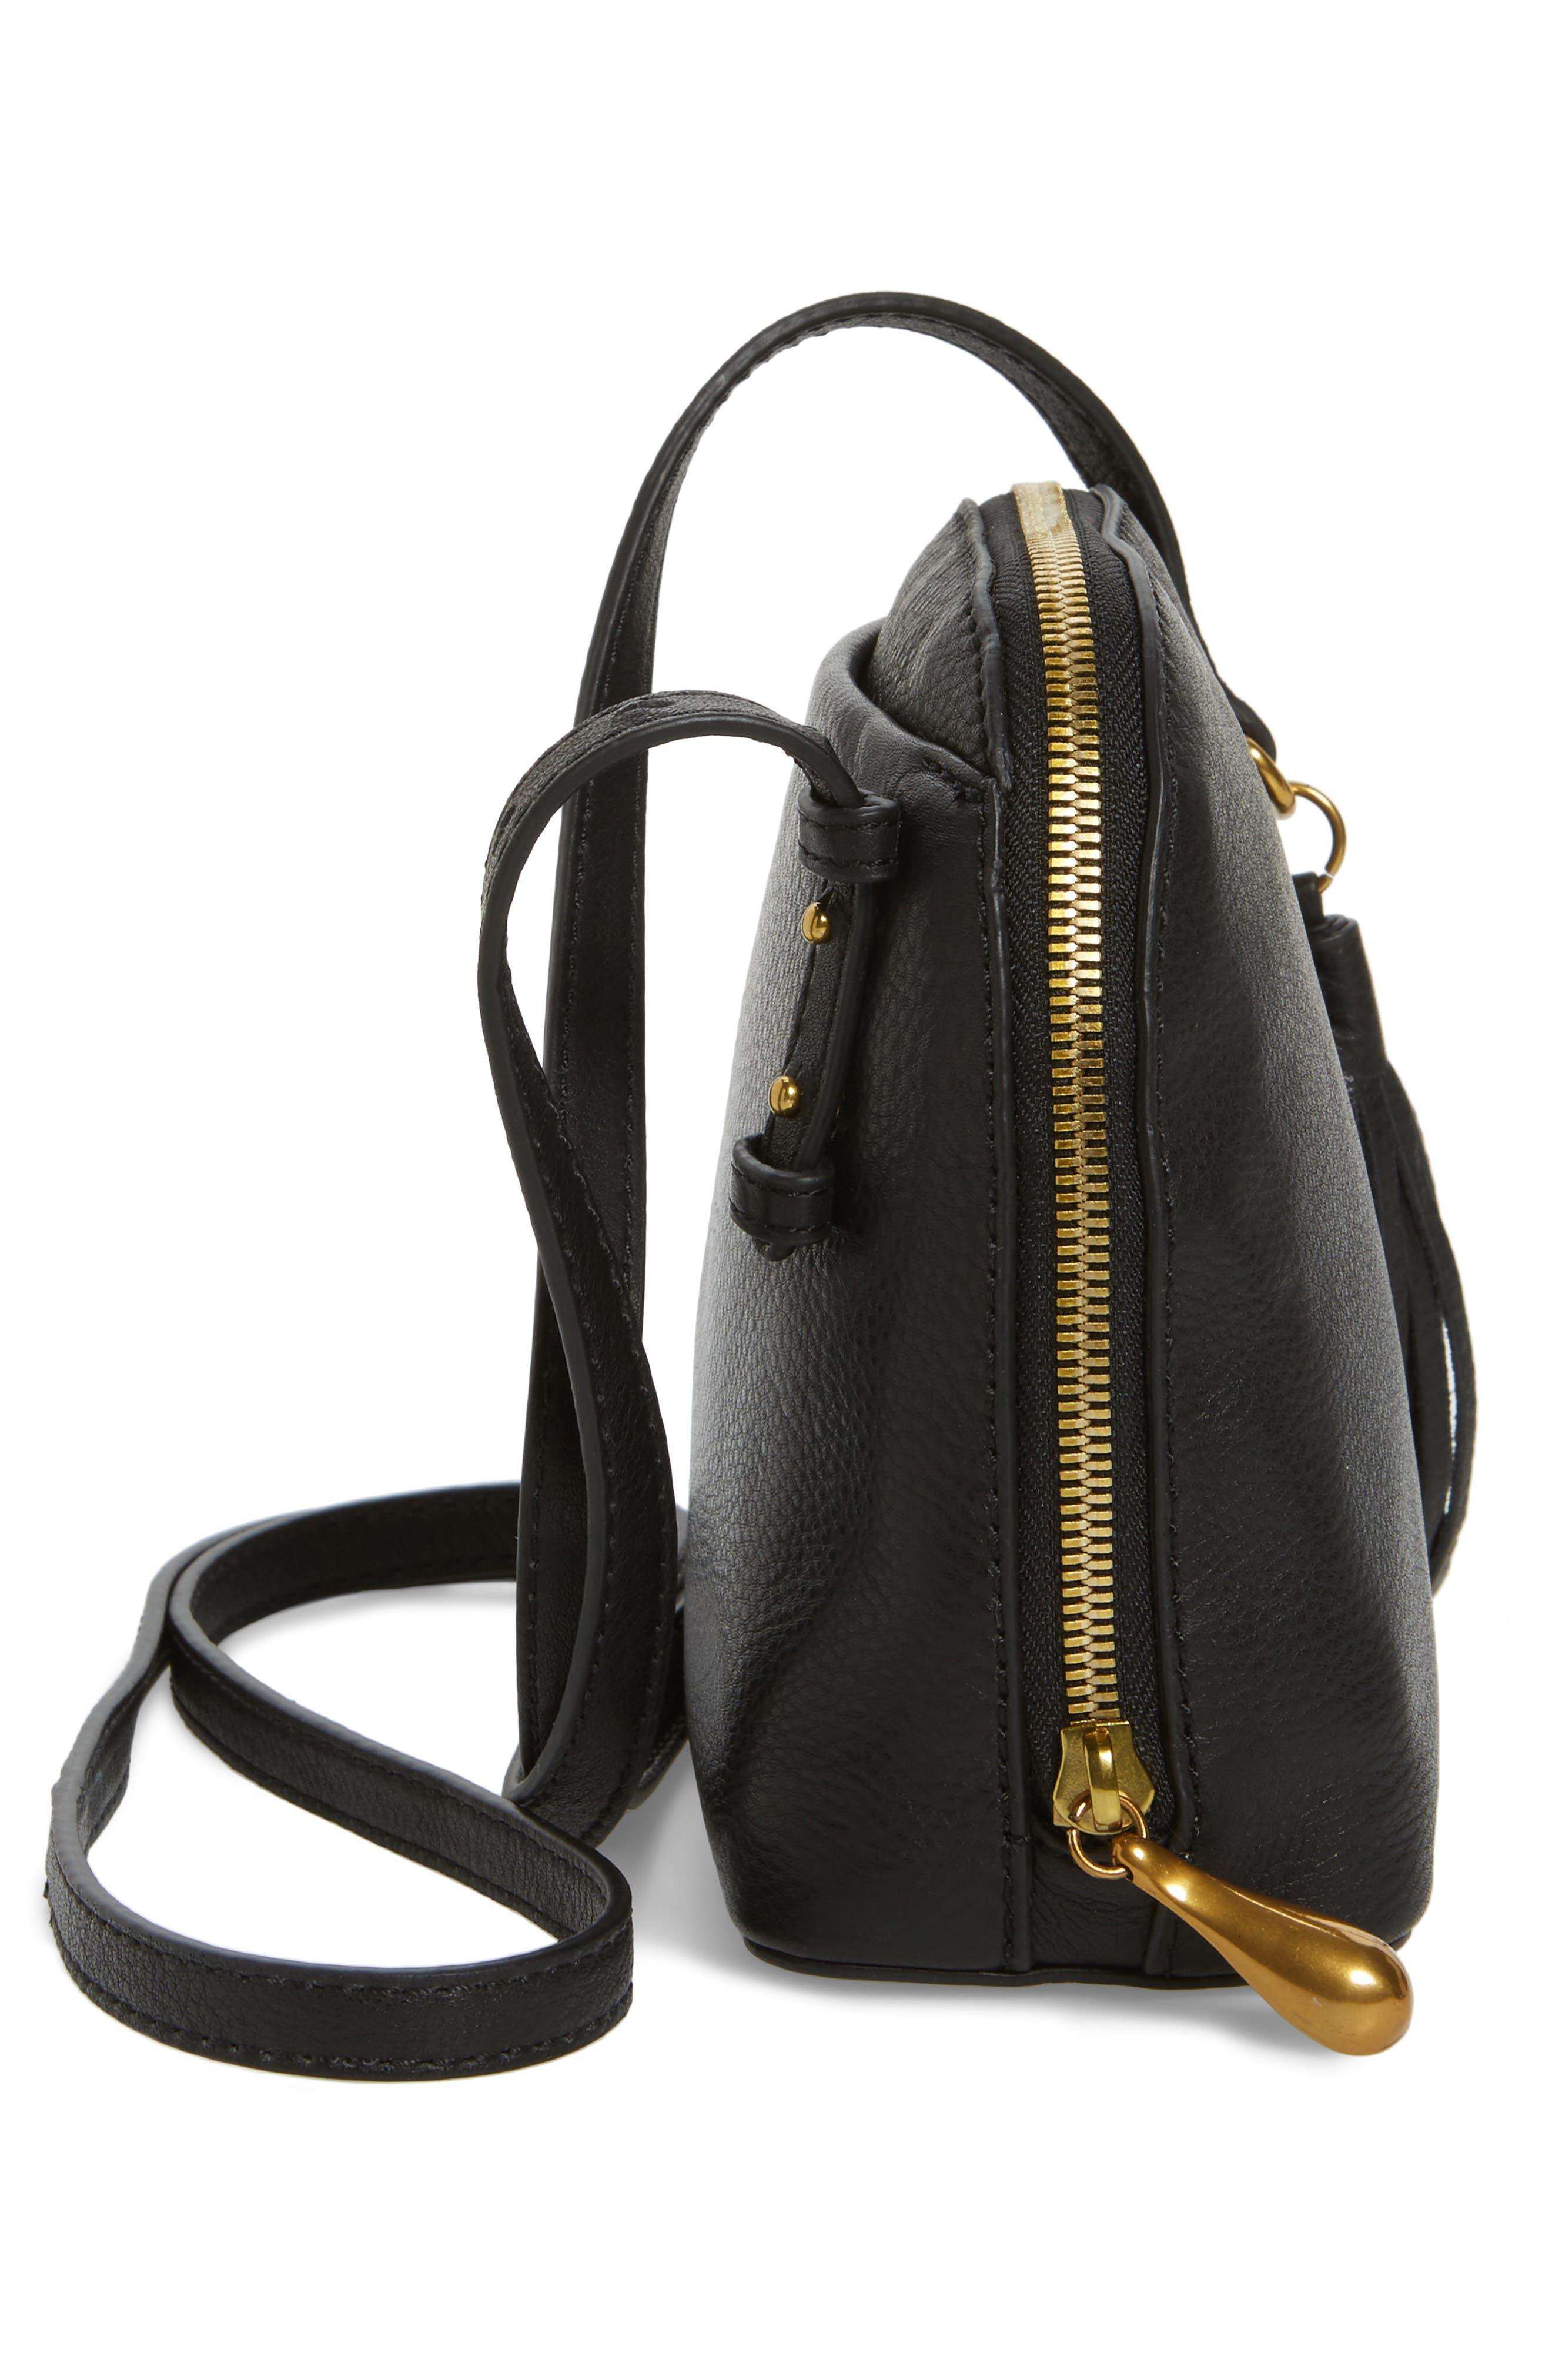 Nash Calfskin Leather Crossbody Bag,                             Alternate thumbnail 5, color,                             Black